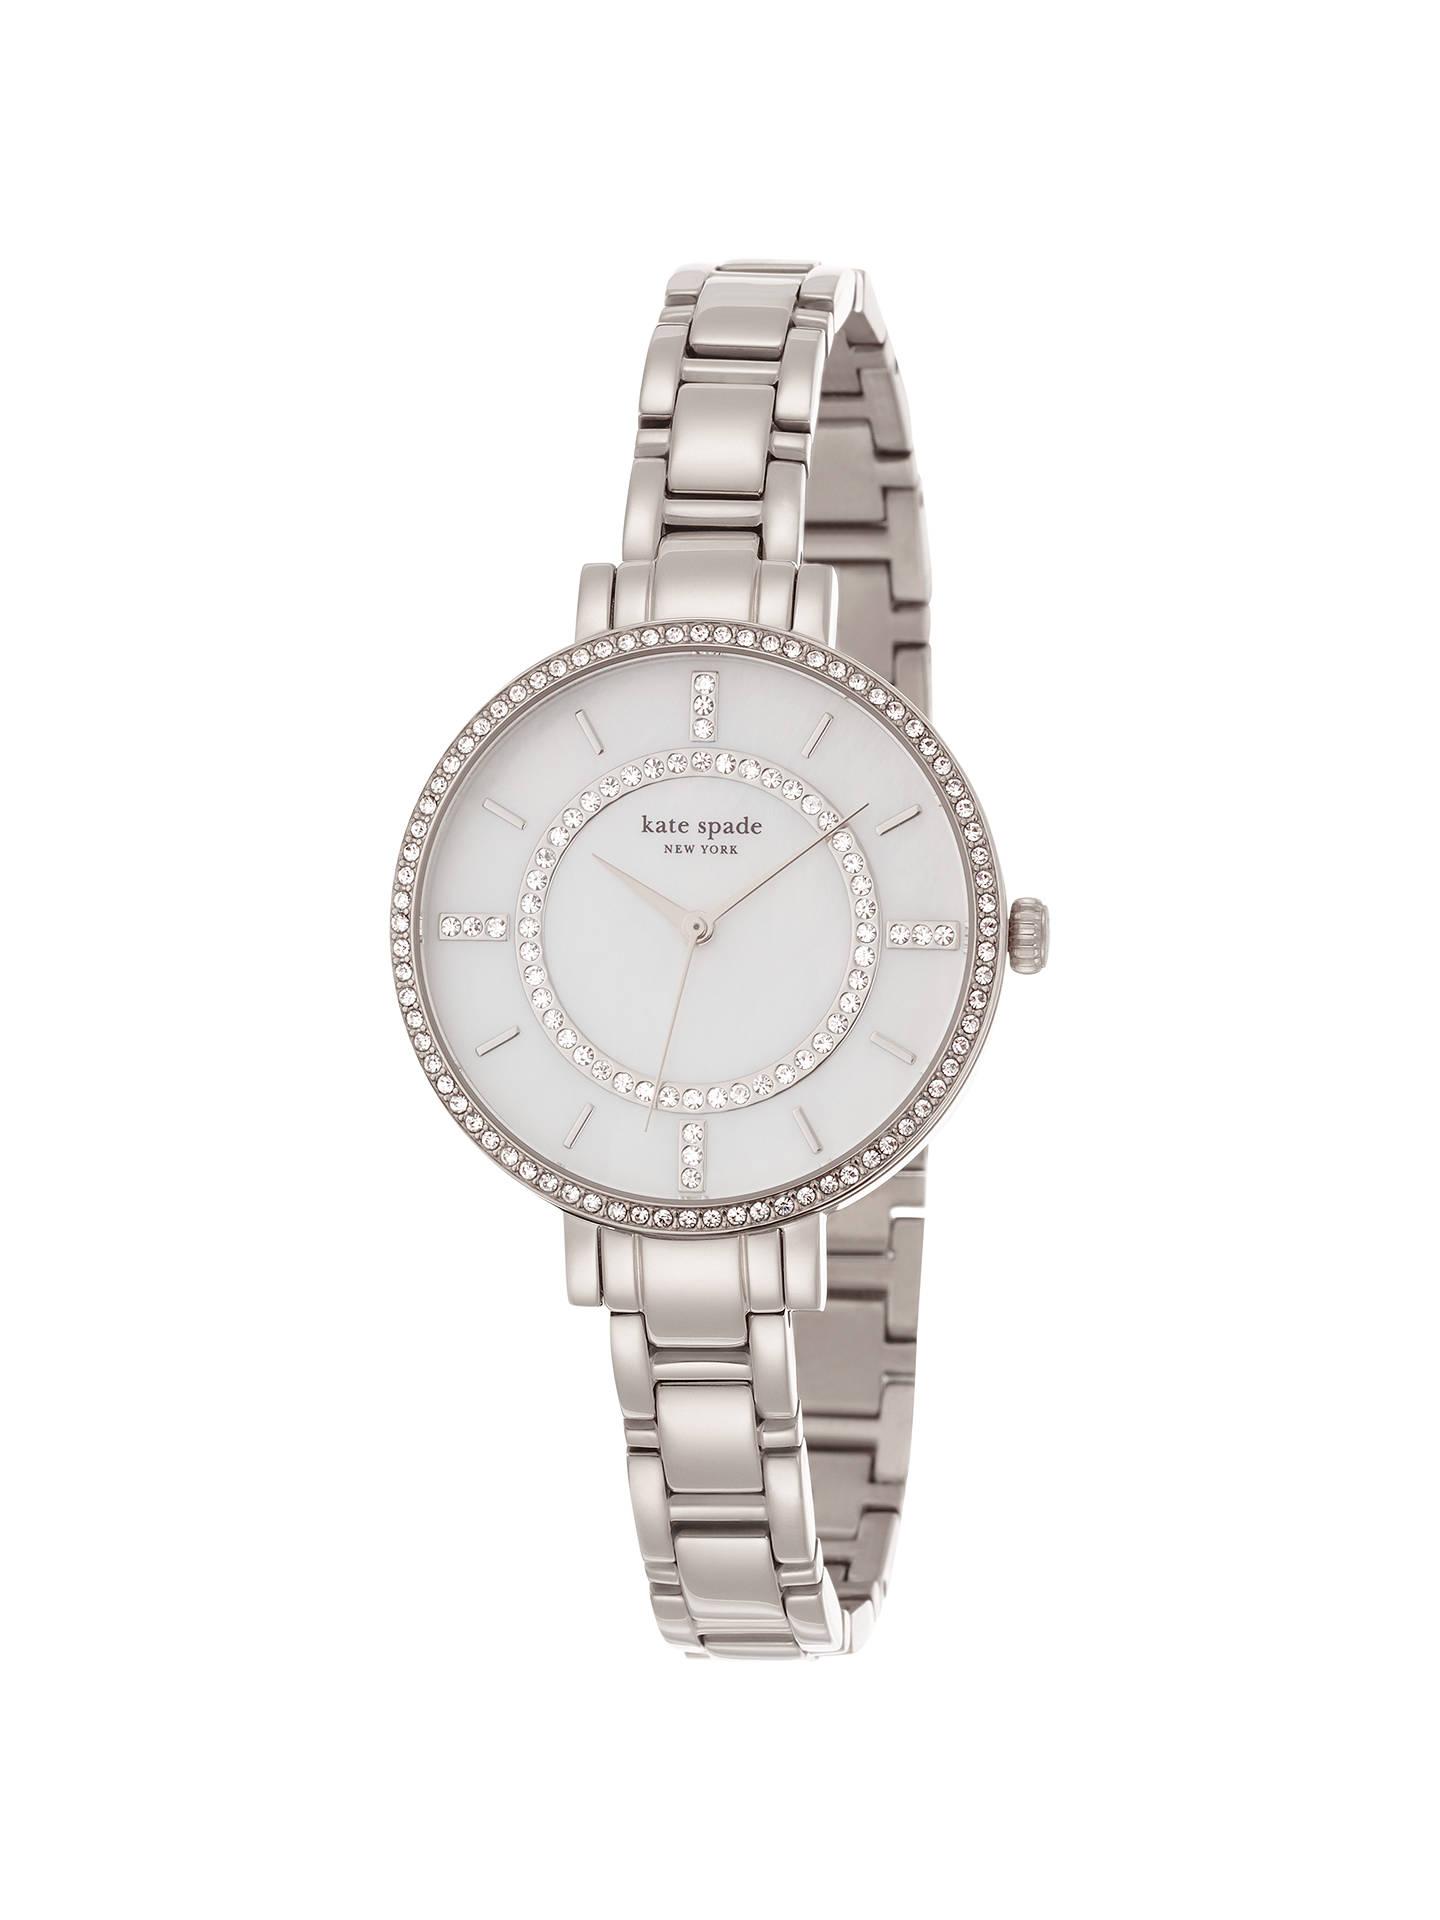 6dc5b3976 Buy kate spade new york 1YRU0691 Women's Gramercy Skinny Stainless Steel  Bracelet Strap Watch, Silver